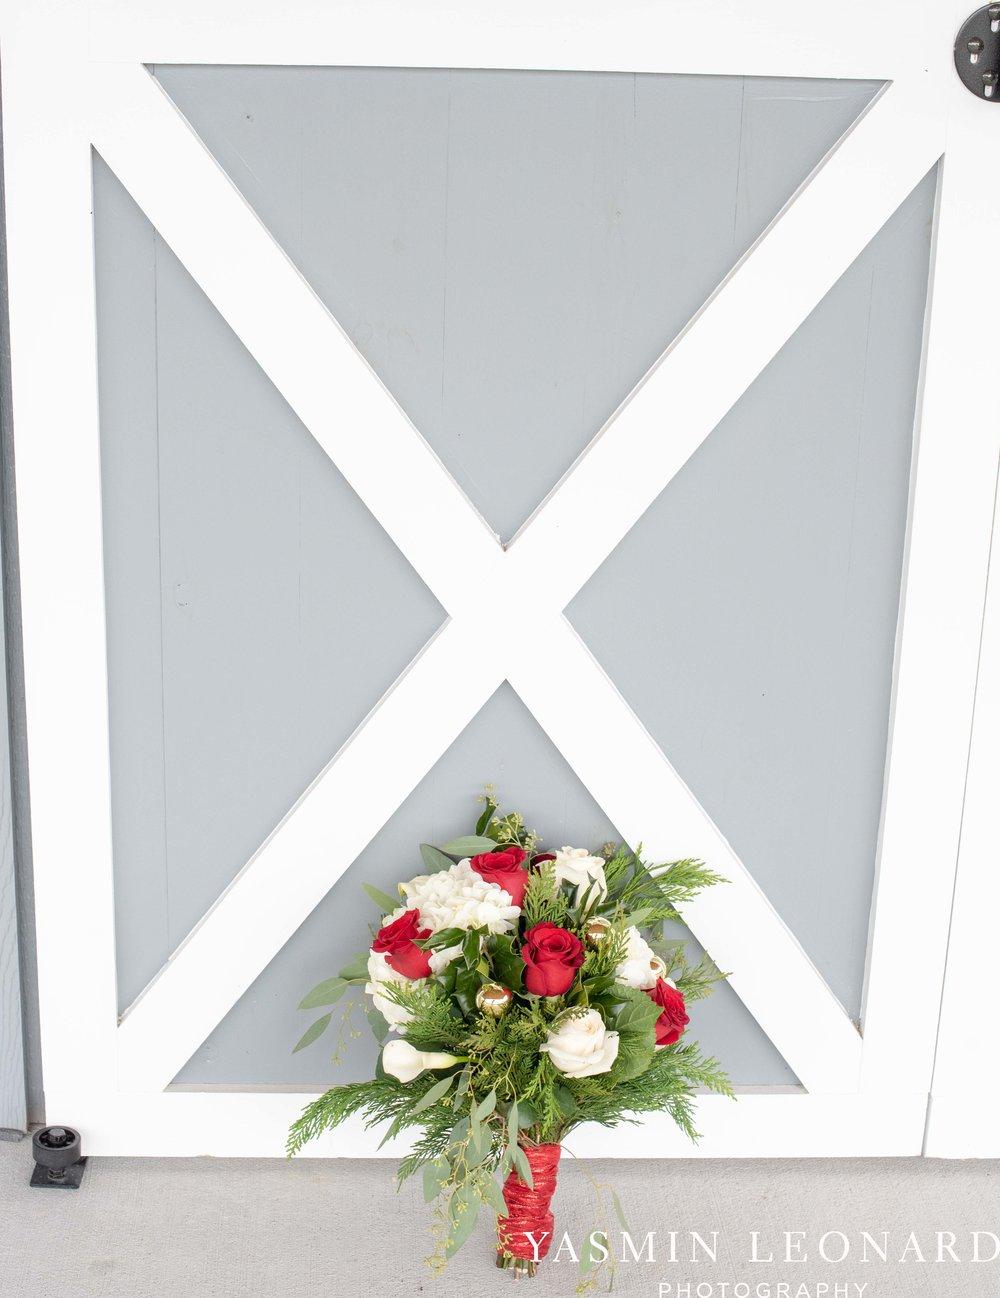 Secret Meadows at Green Dell Farm, NC Barns, NC Wedding Venues, Triad, NC, NC Wedding Photography, Triad Wedding Venues, Affordable Wedding Venues, NEW Wedding Venues, Christmas Weddings-2.jpg